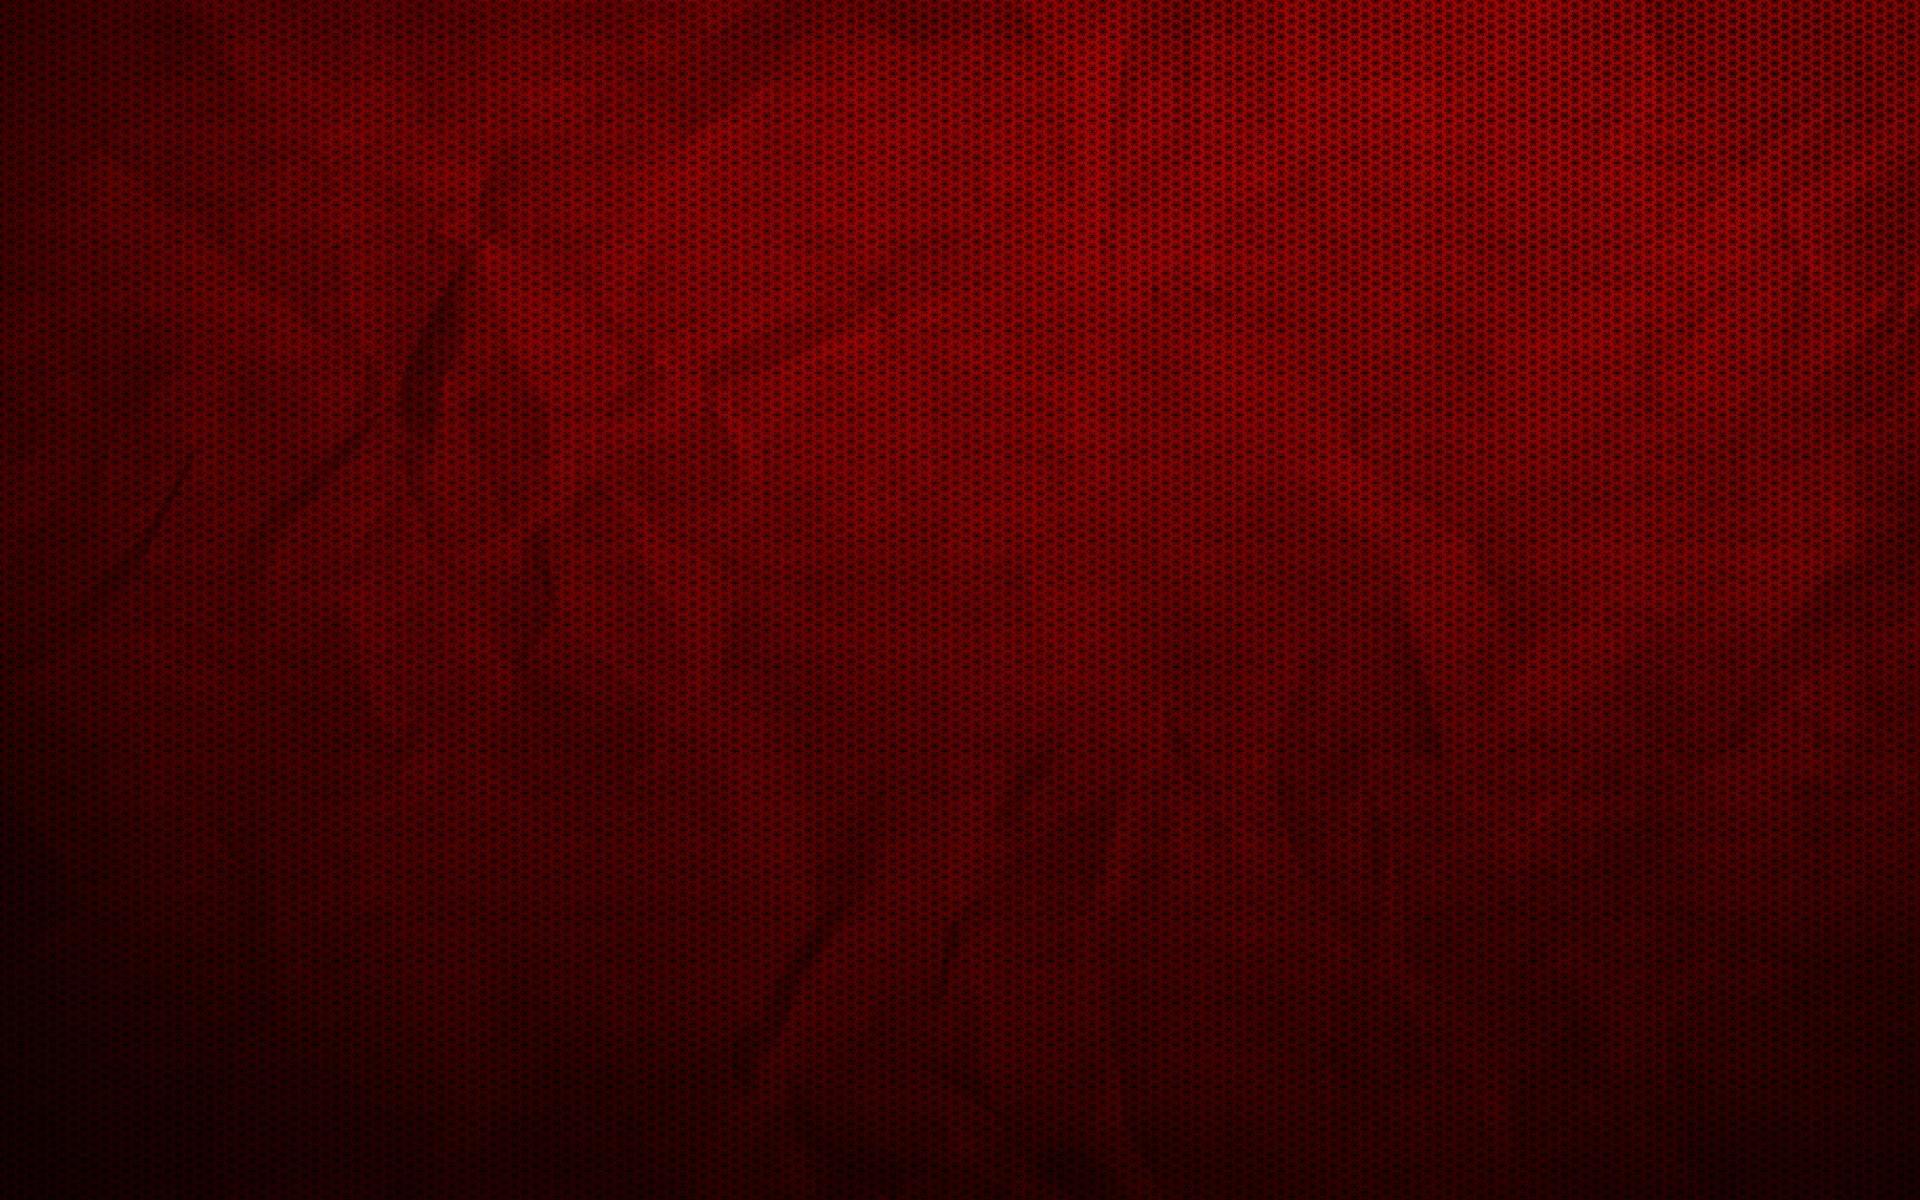 dark red background wallpapersafari